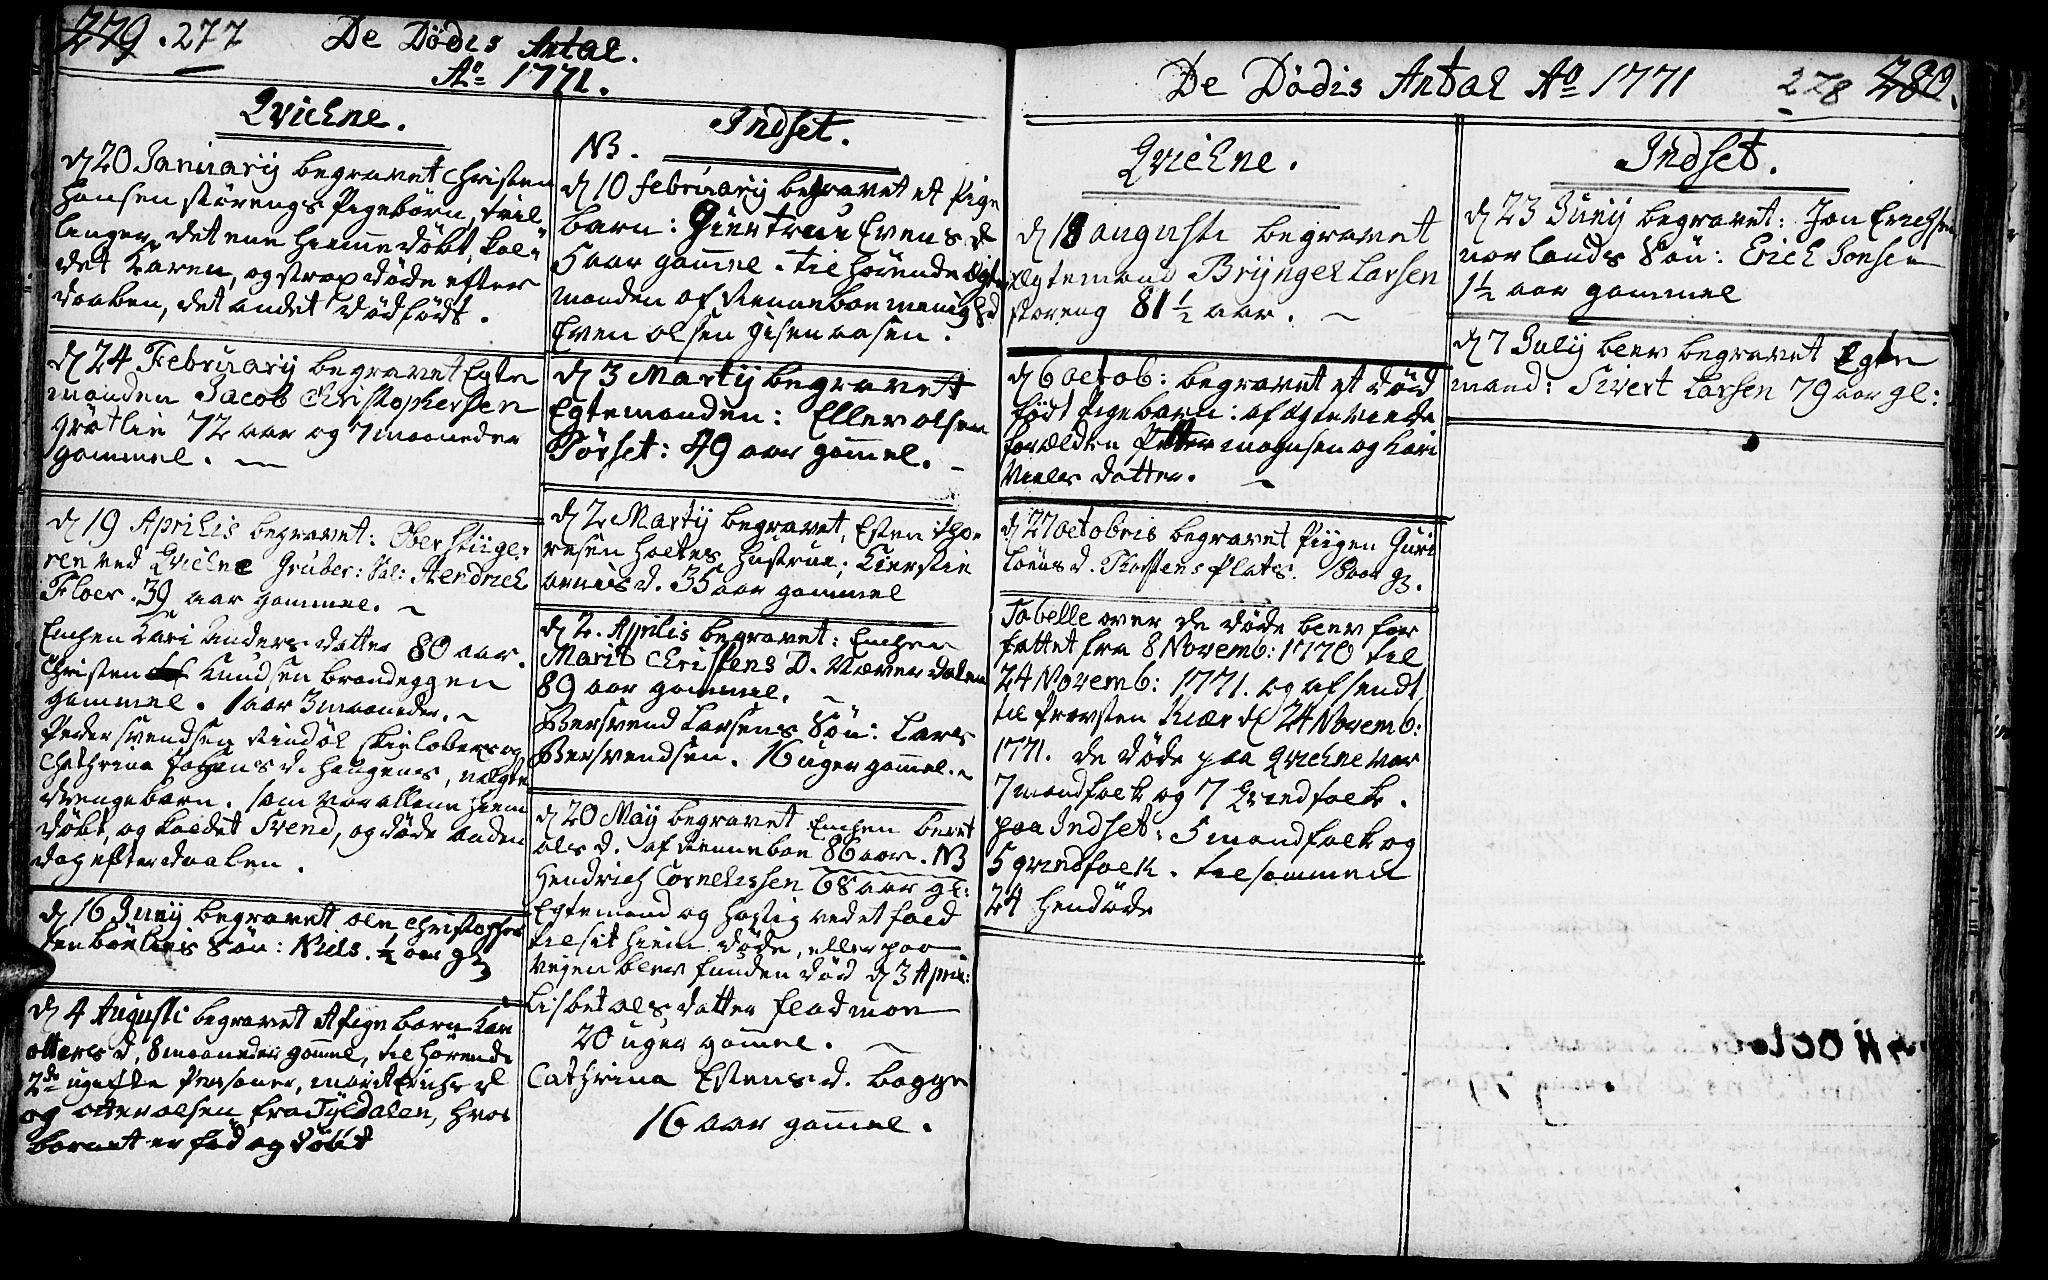 SAH, Kvikne prestekontor, Ministerialbok nr. 2, 1764-1784, s. 277-278